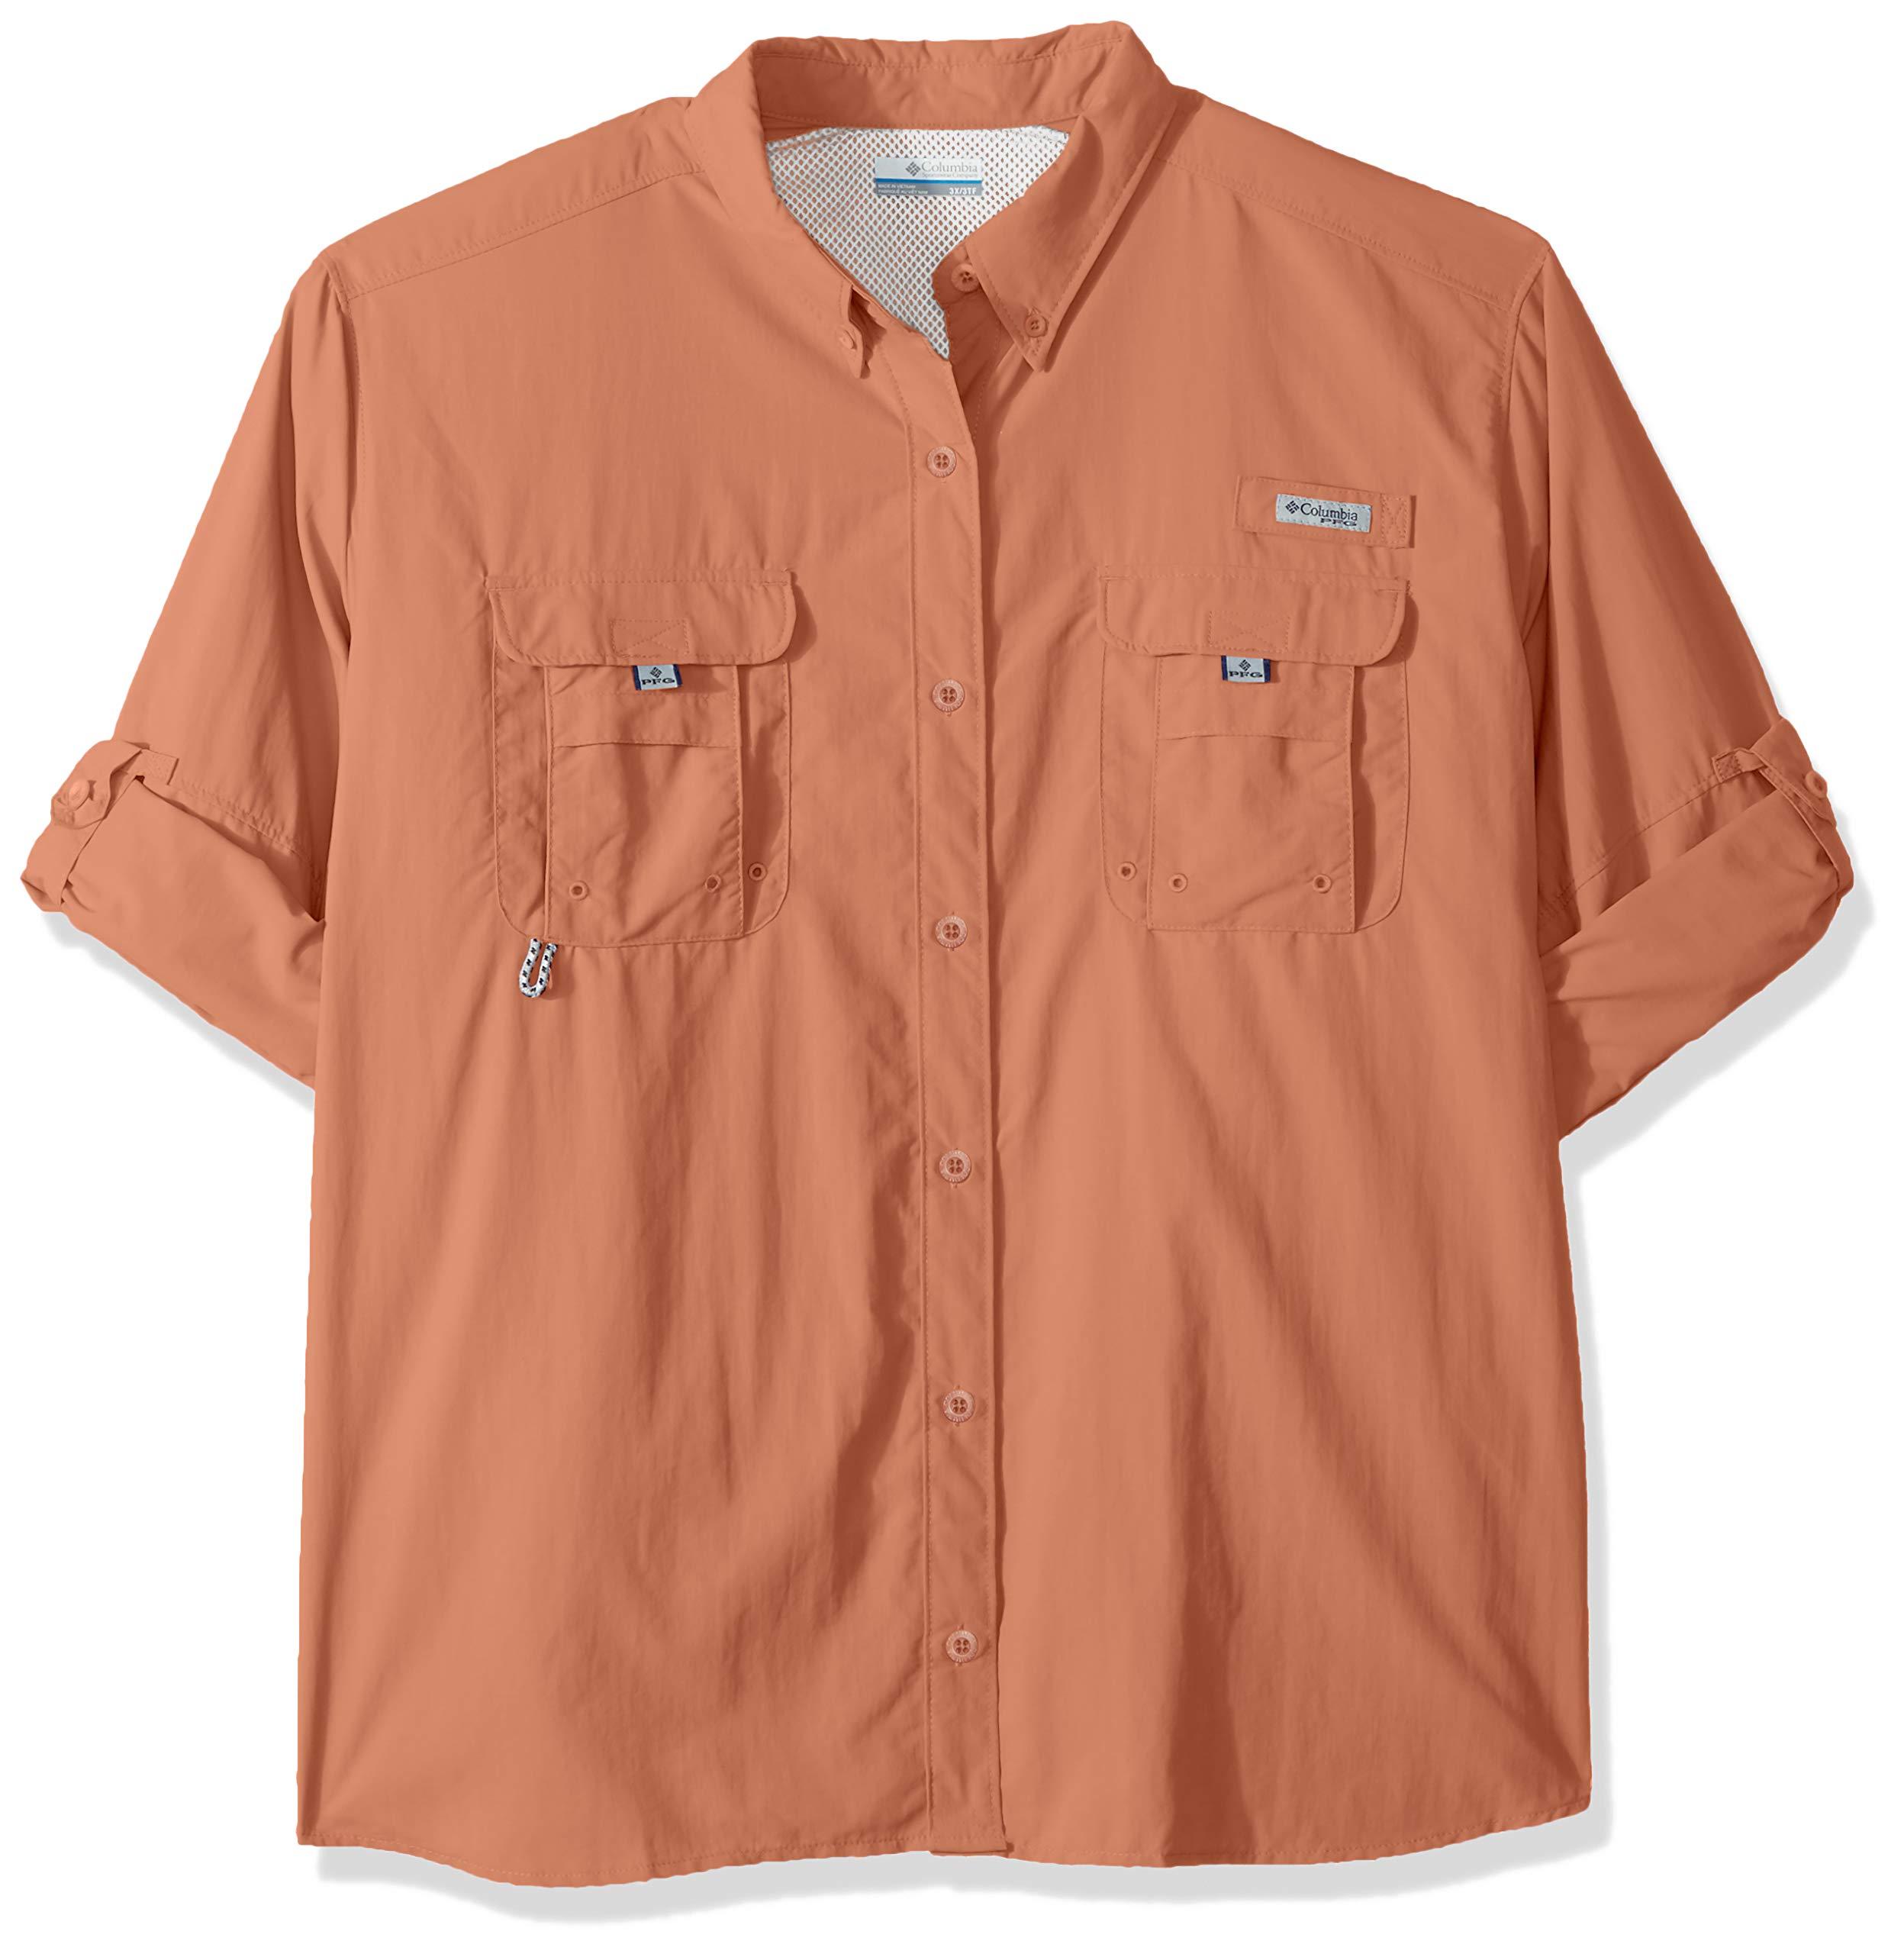 Columbia Women's PFG Bahama II Long Sleeve Shirt, Breathable, UV Protection